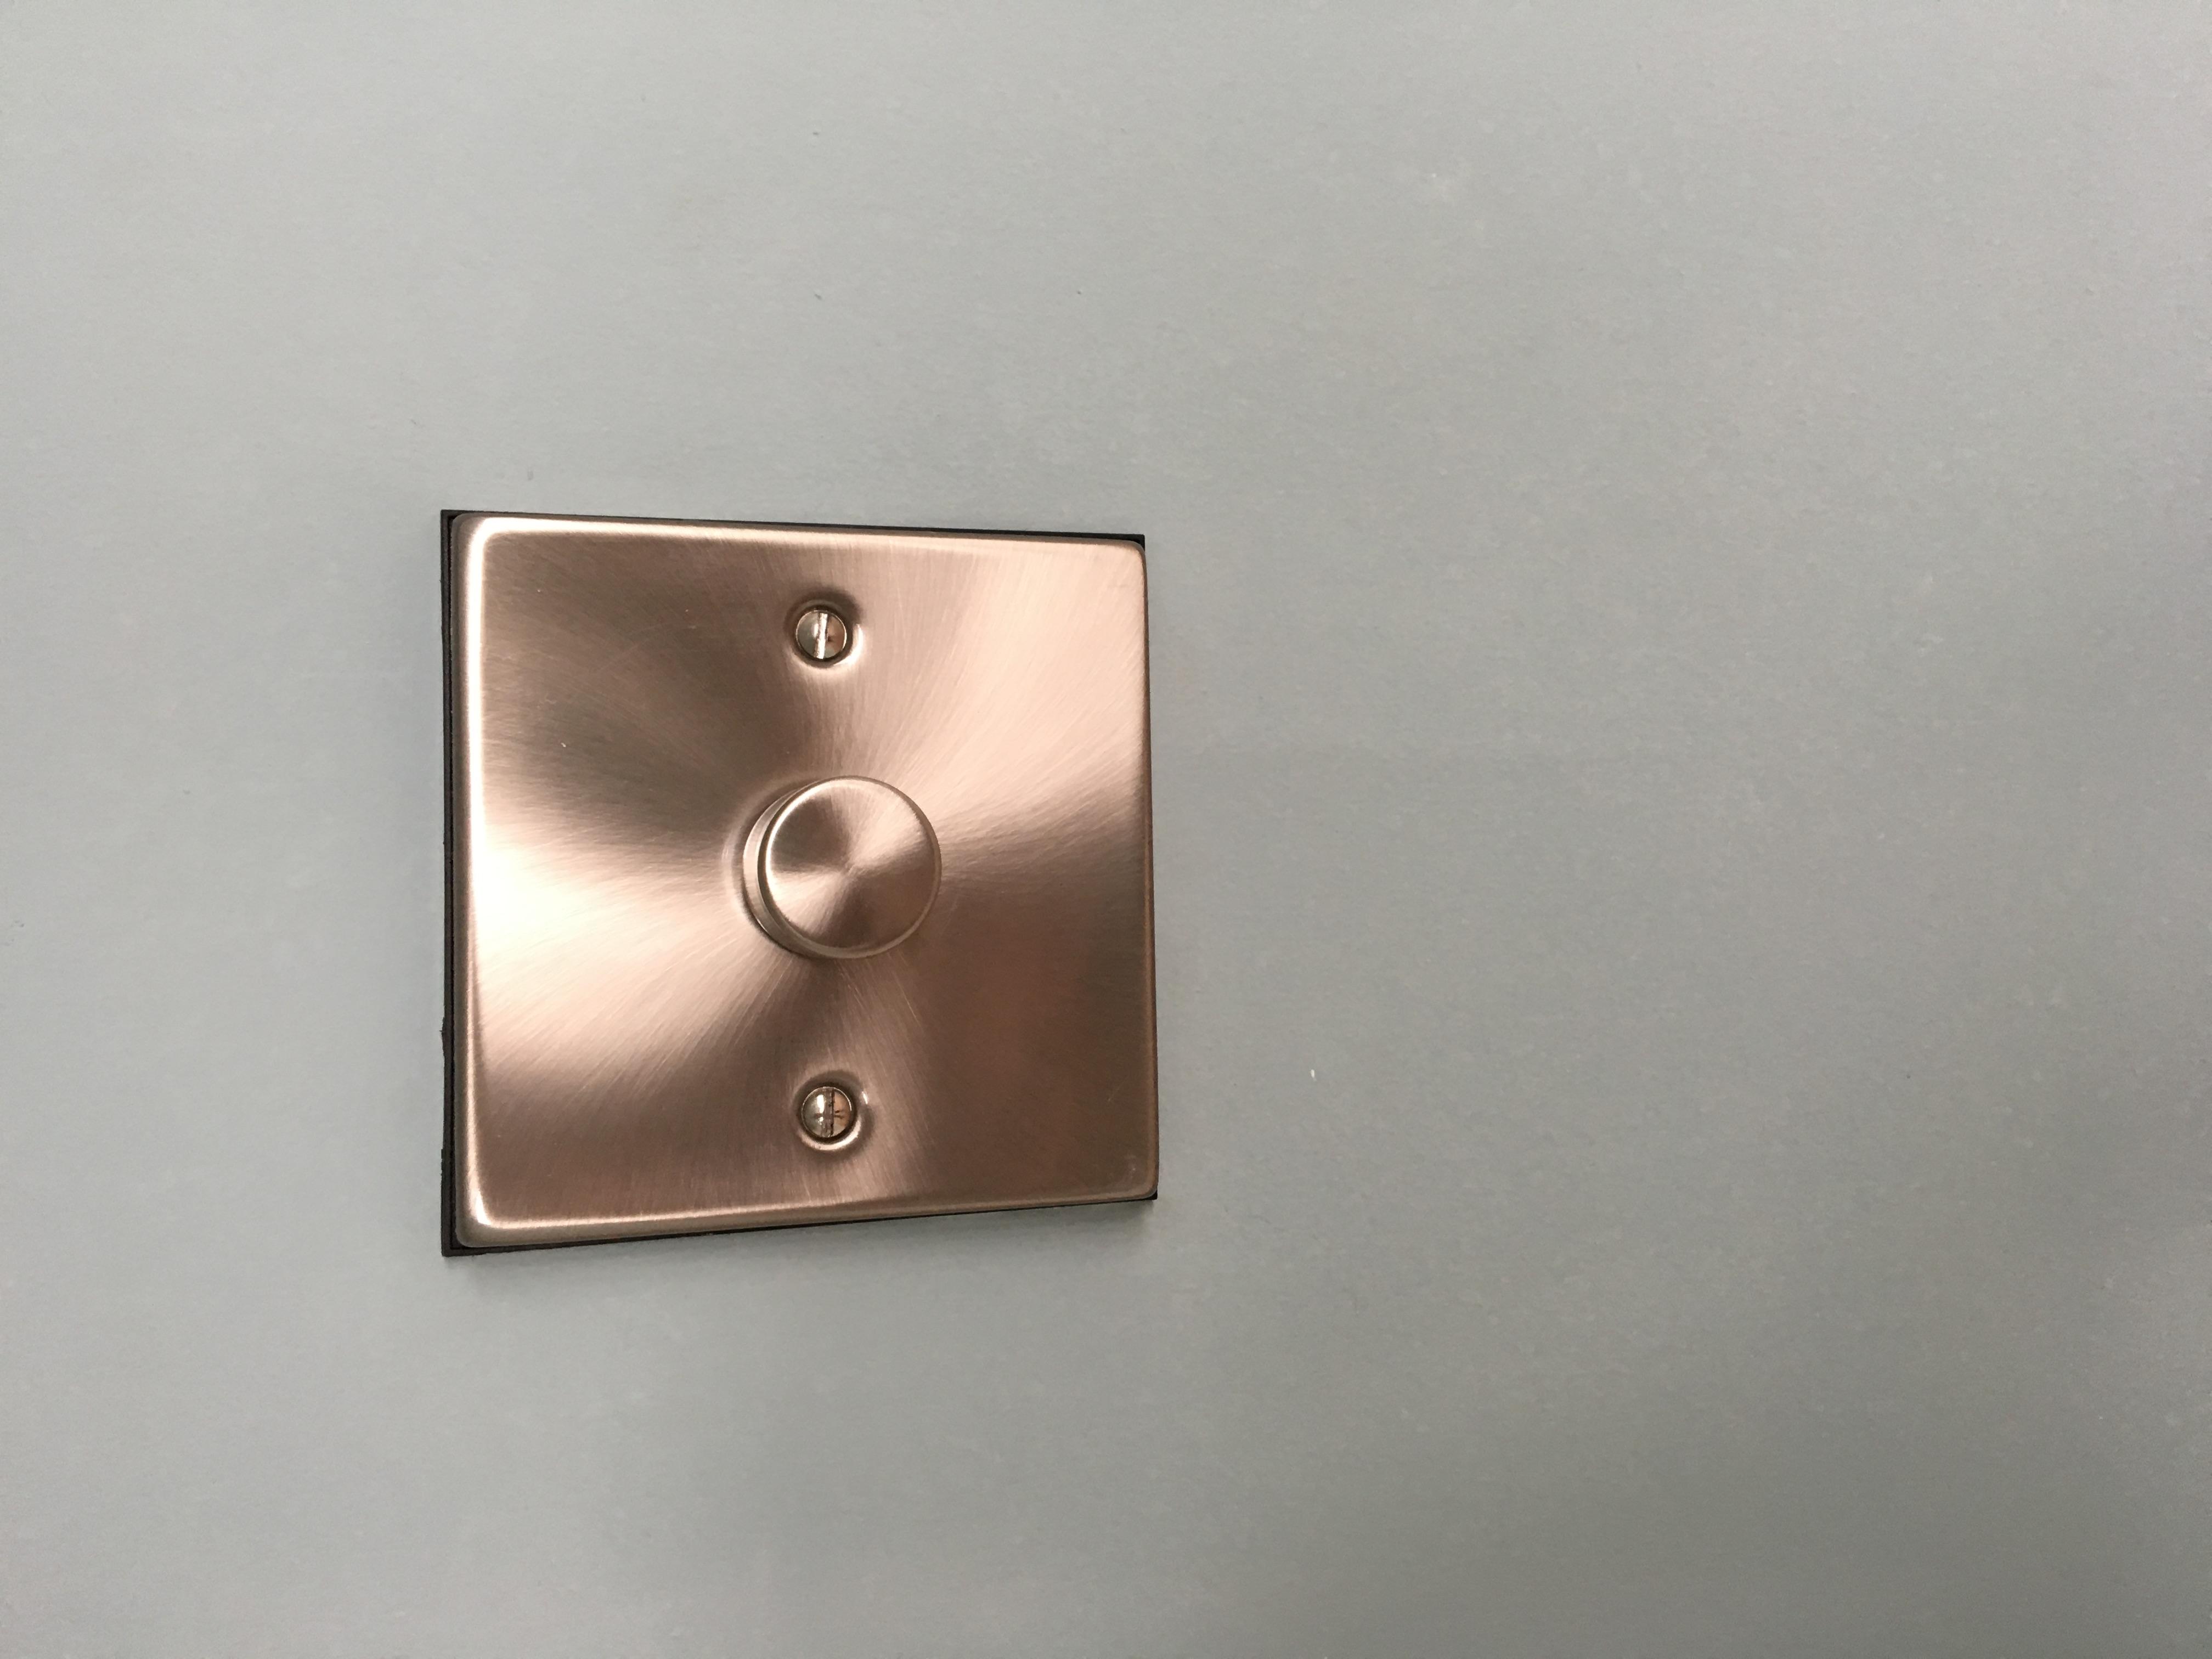 Amp Electrical - Lighting Rewire